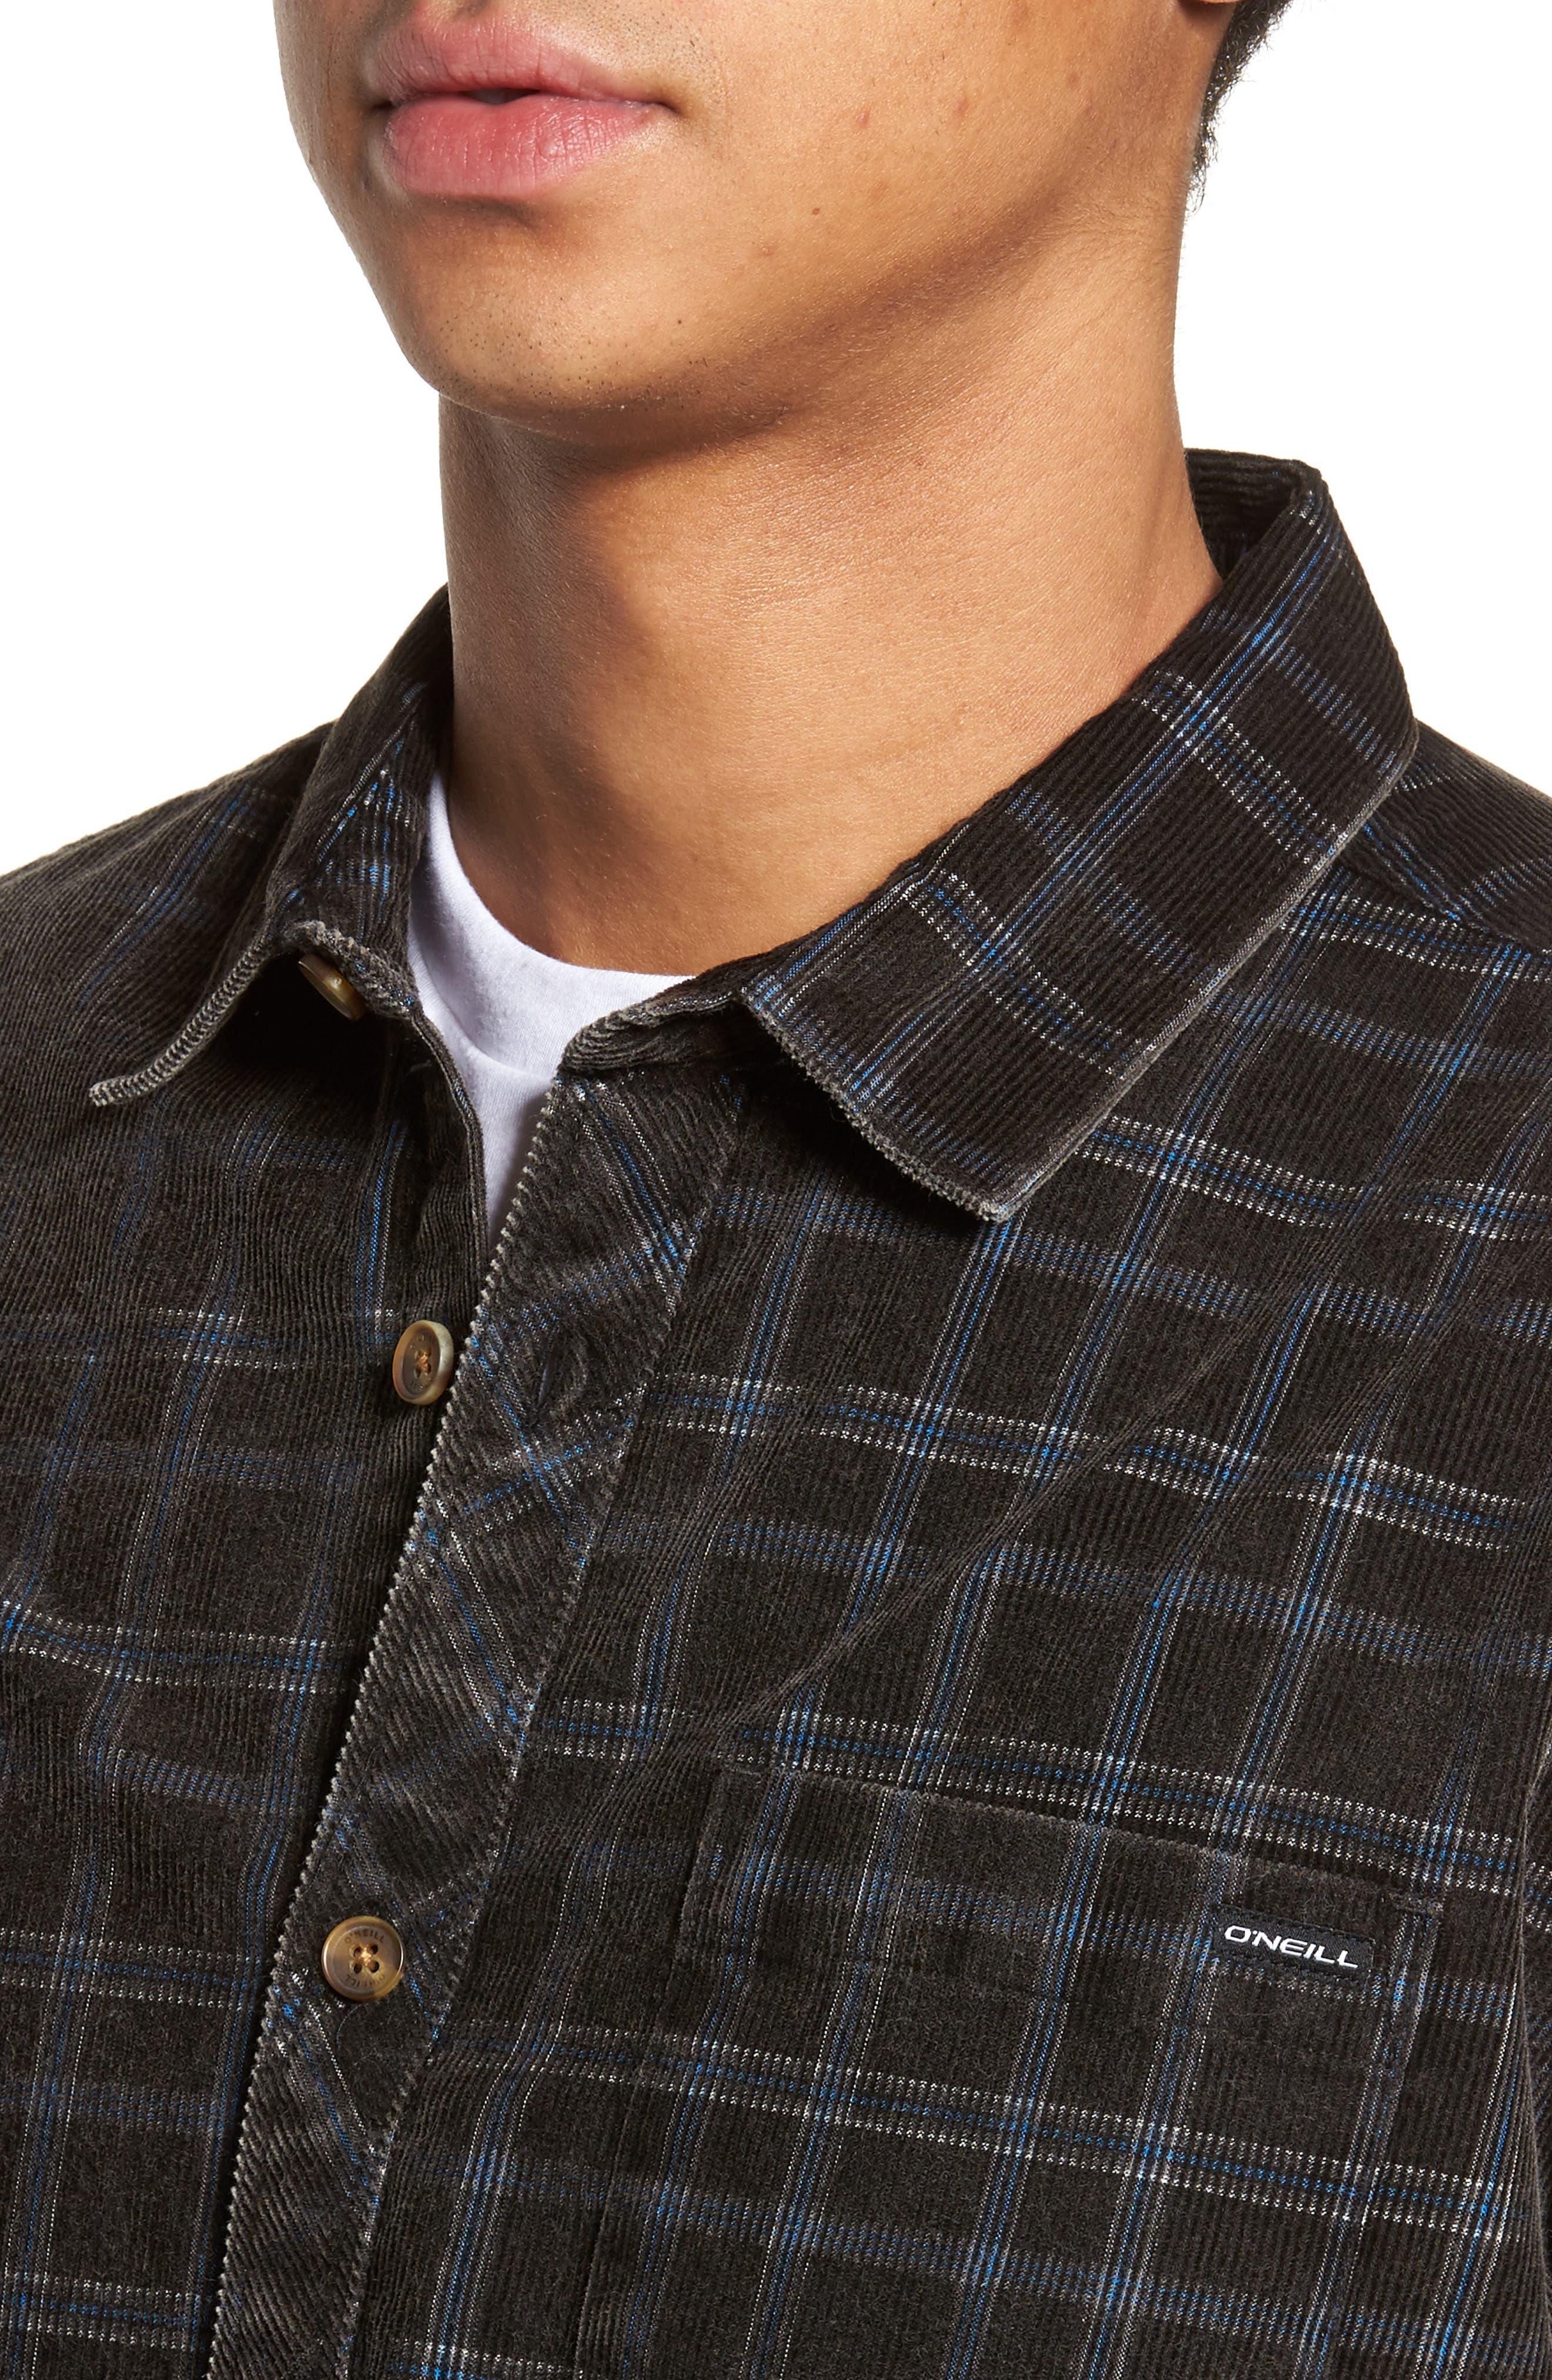 Bradley Corduroy Shirt,                             Alternate thumbnail 4, color,                             001